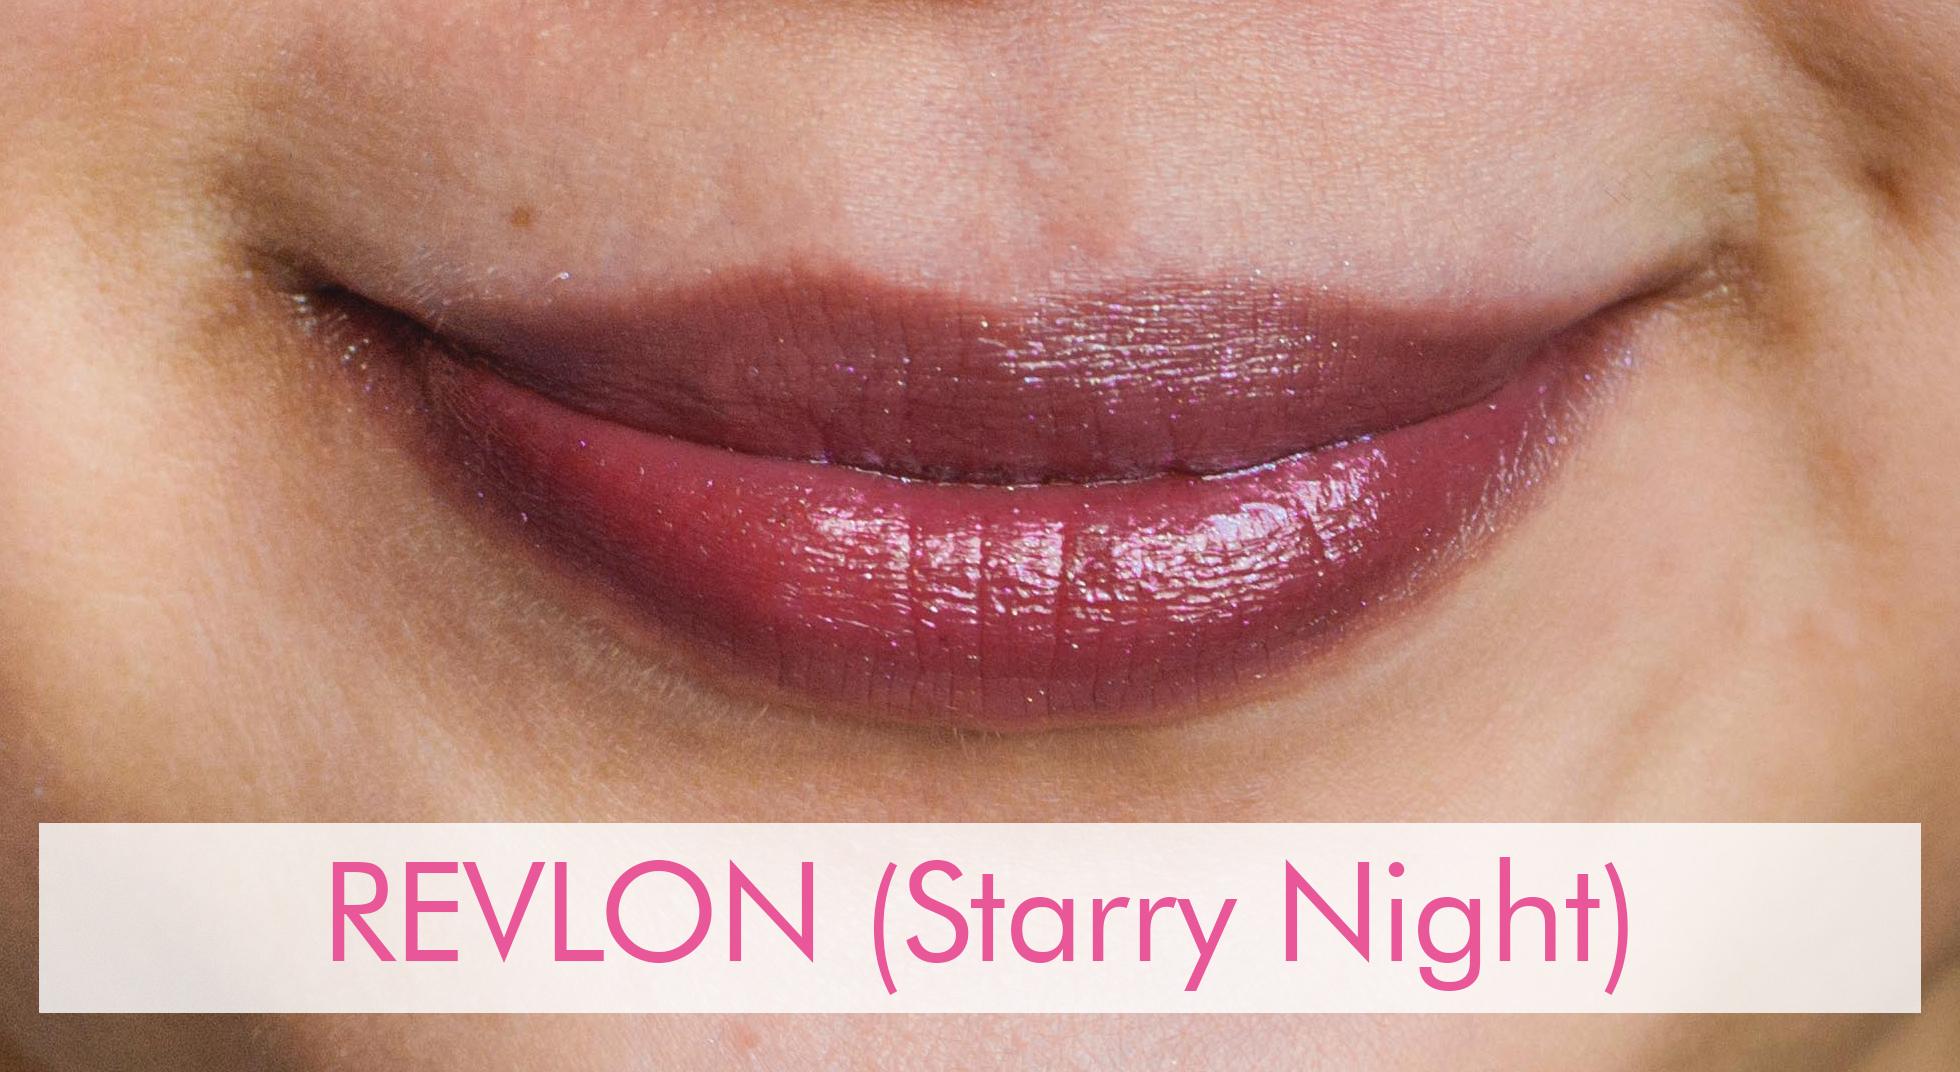 REVLON-StarryNight_tinted-lip-balms_nivea-revlon-burts-bees-canmake-make-up-for-ever-happy-skin-lip-ice-k-palette-bobbi-brown_review-philippines_2019.jpg